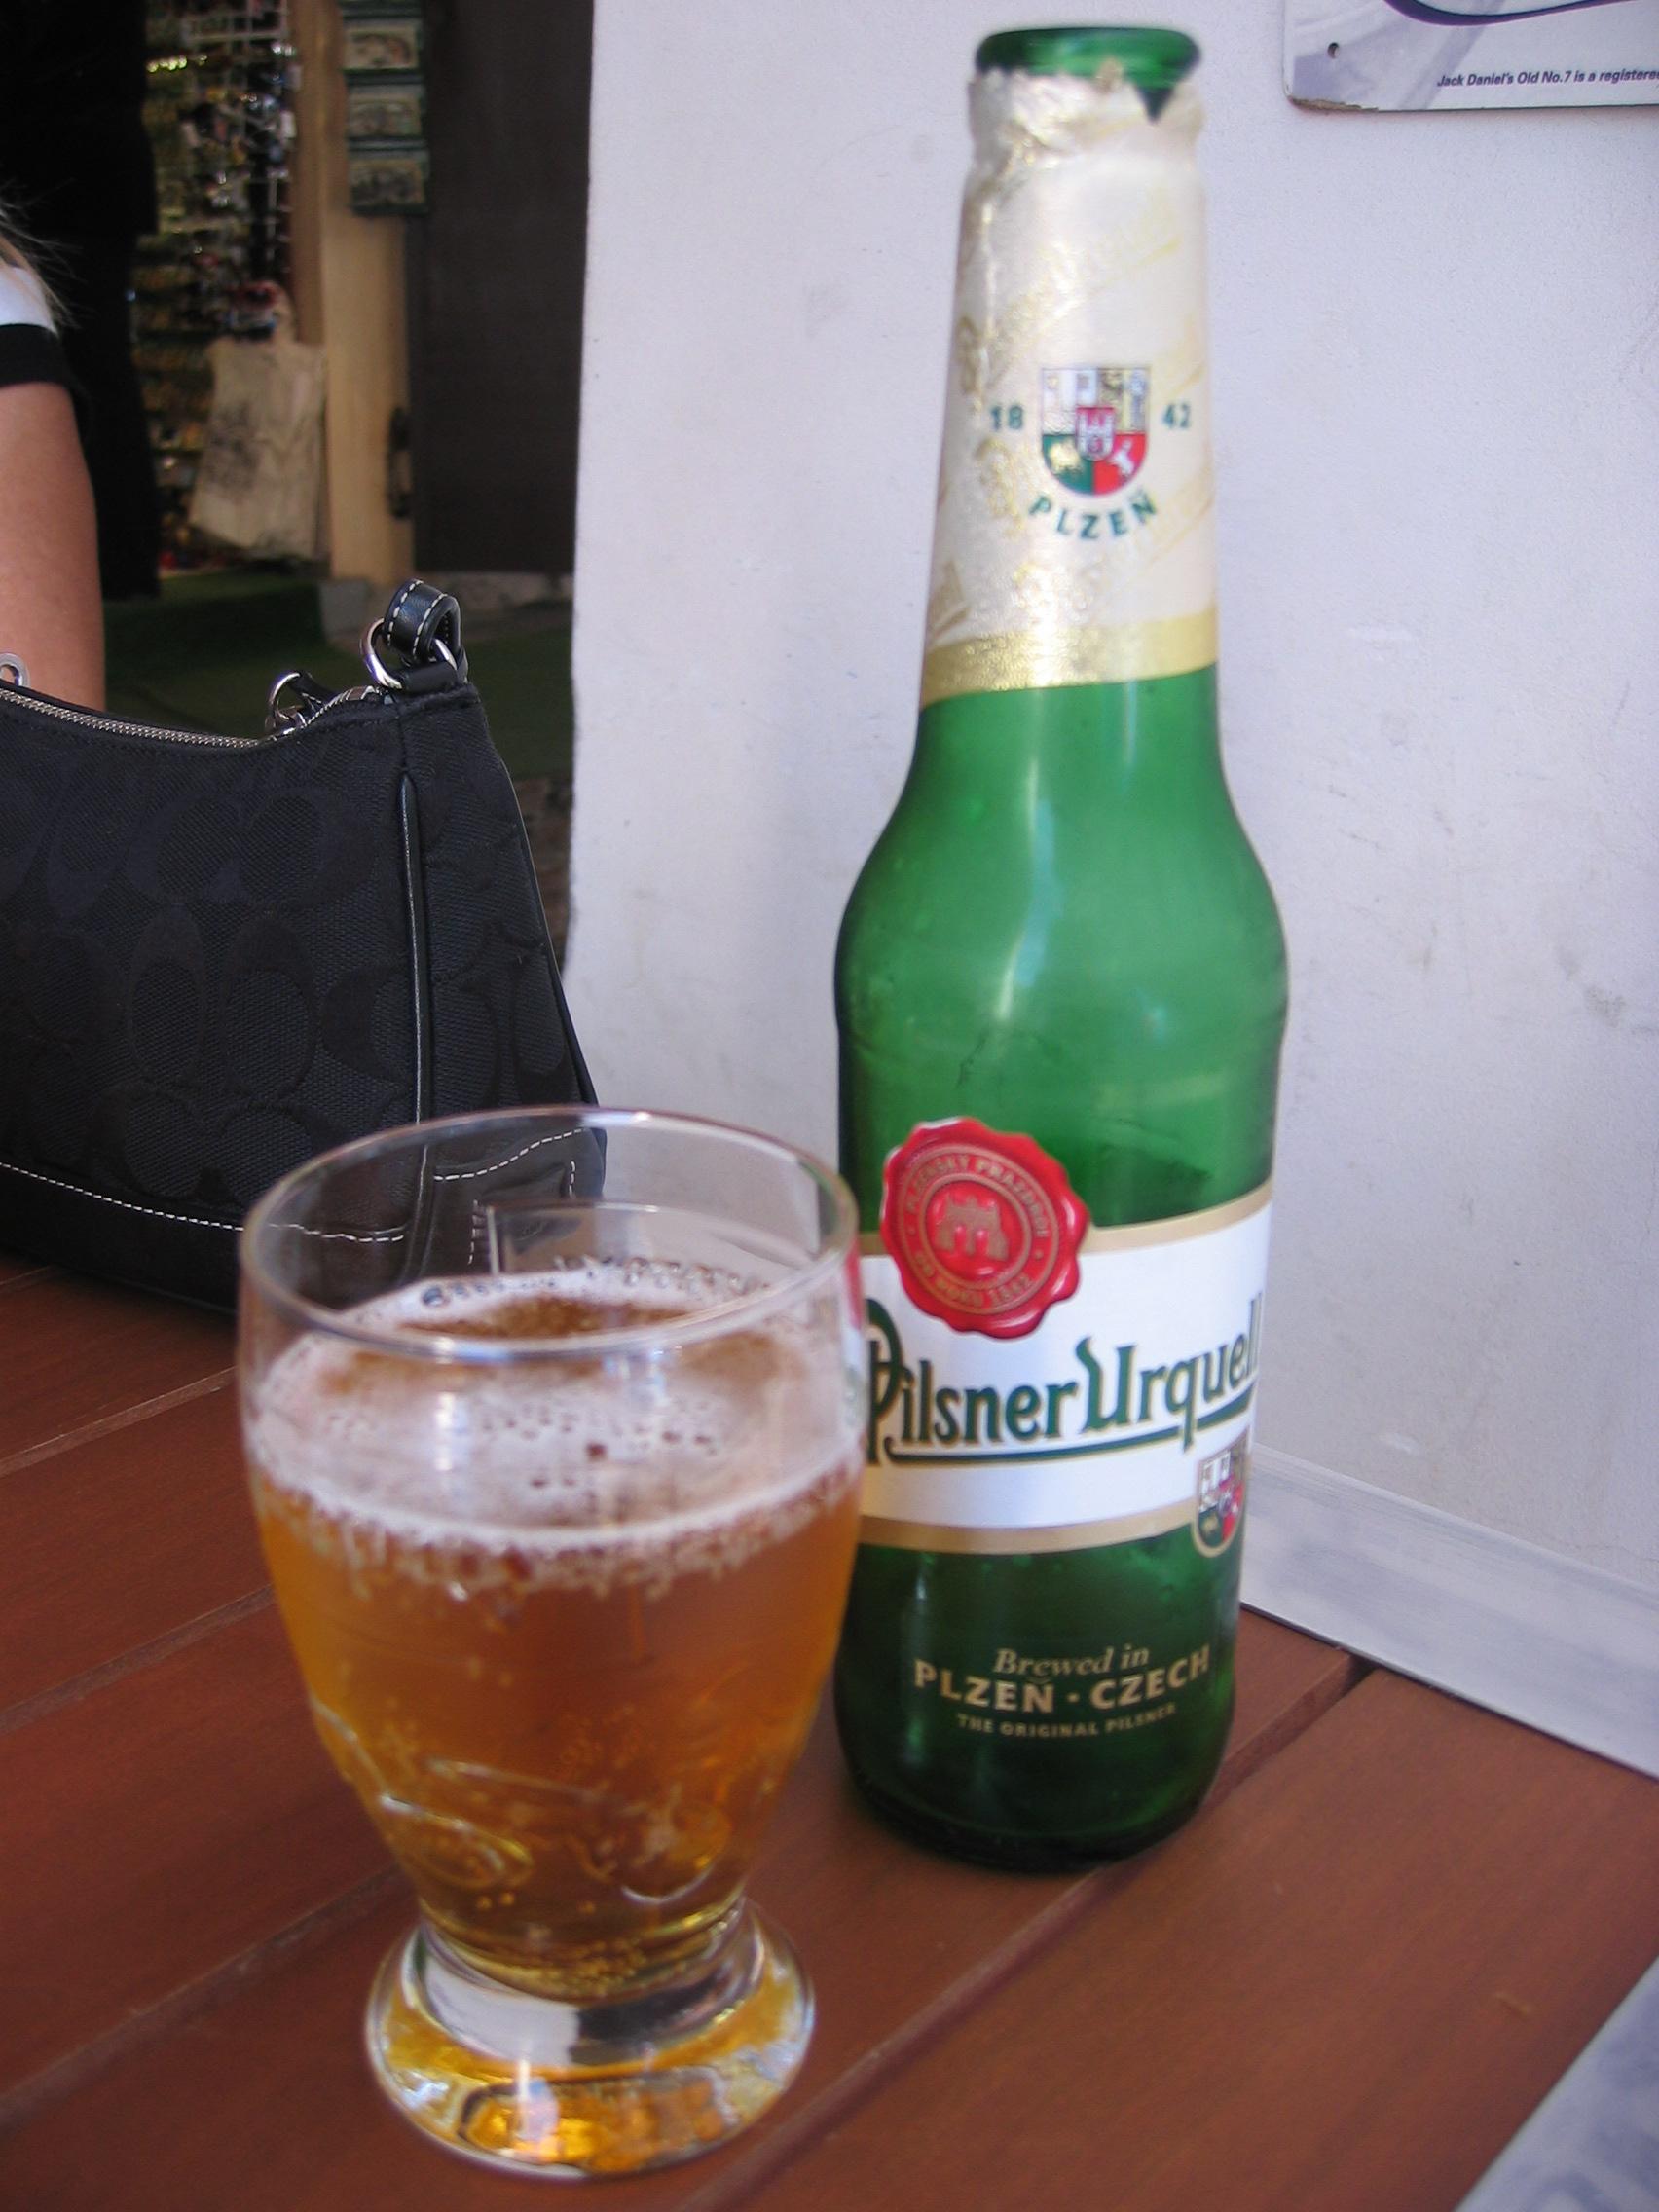 Pilsner Urquell | Beer Wiki | FANDOM powered by Wikia